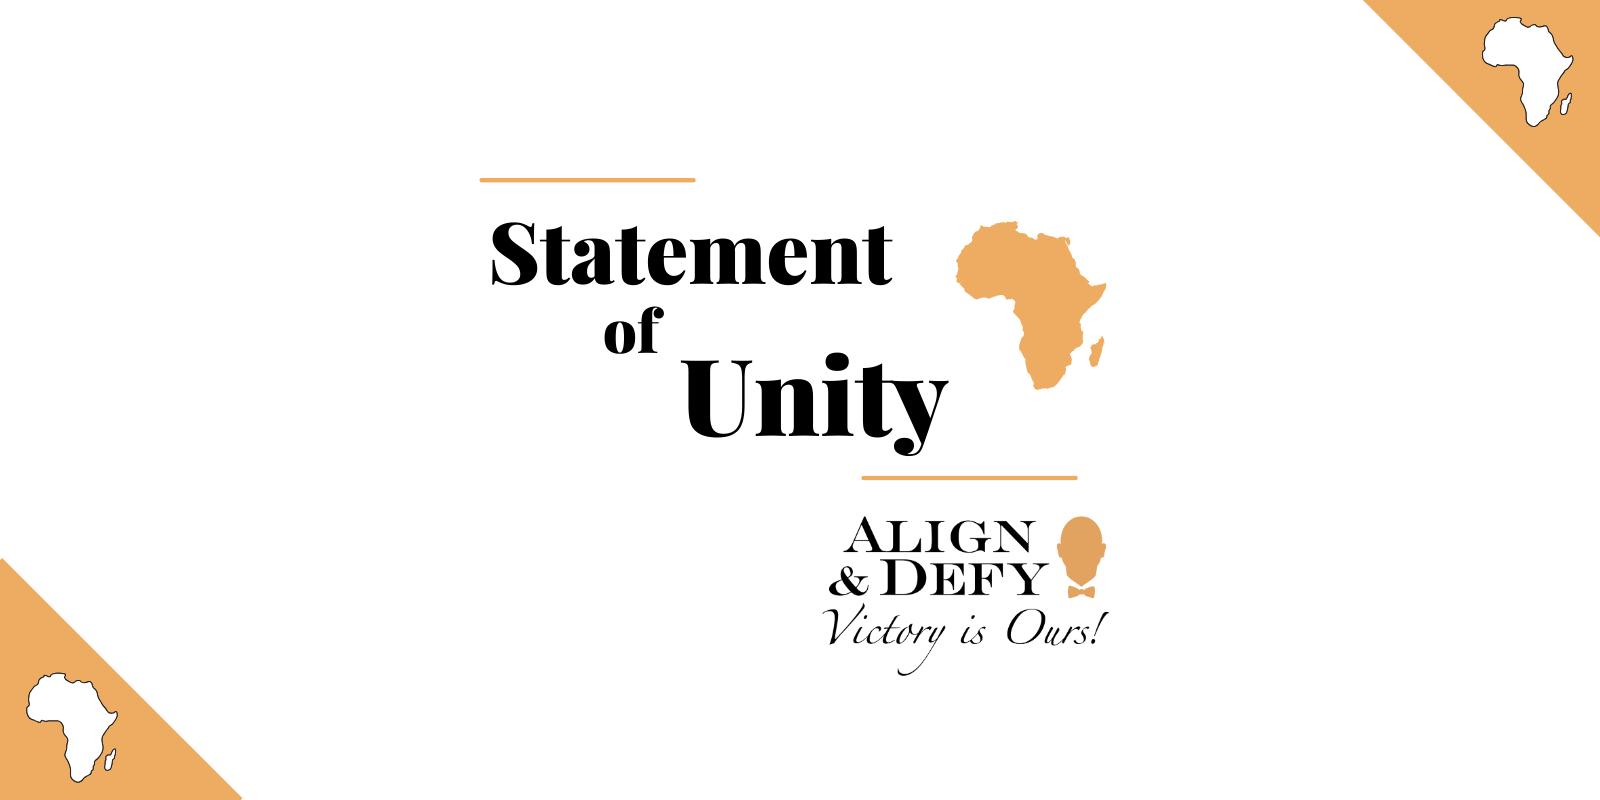 Statement of Unity